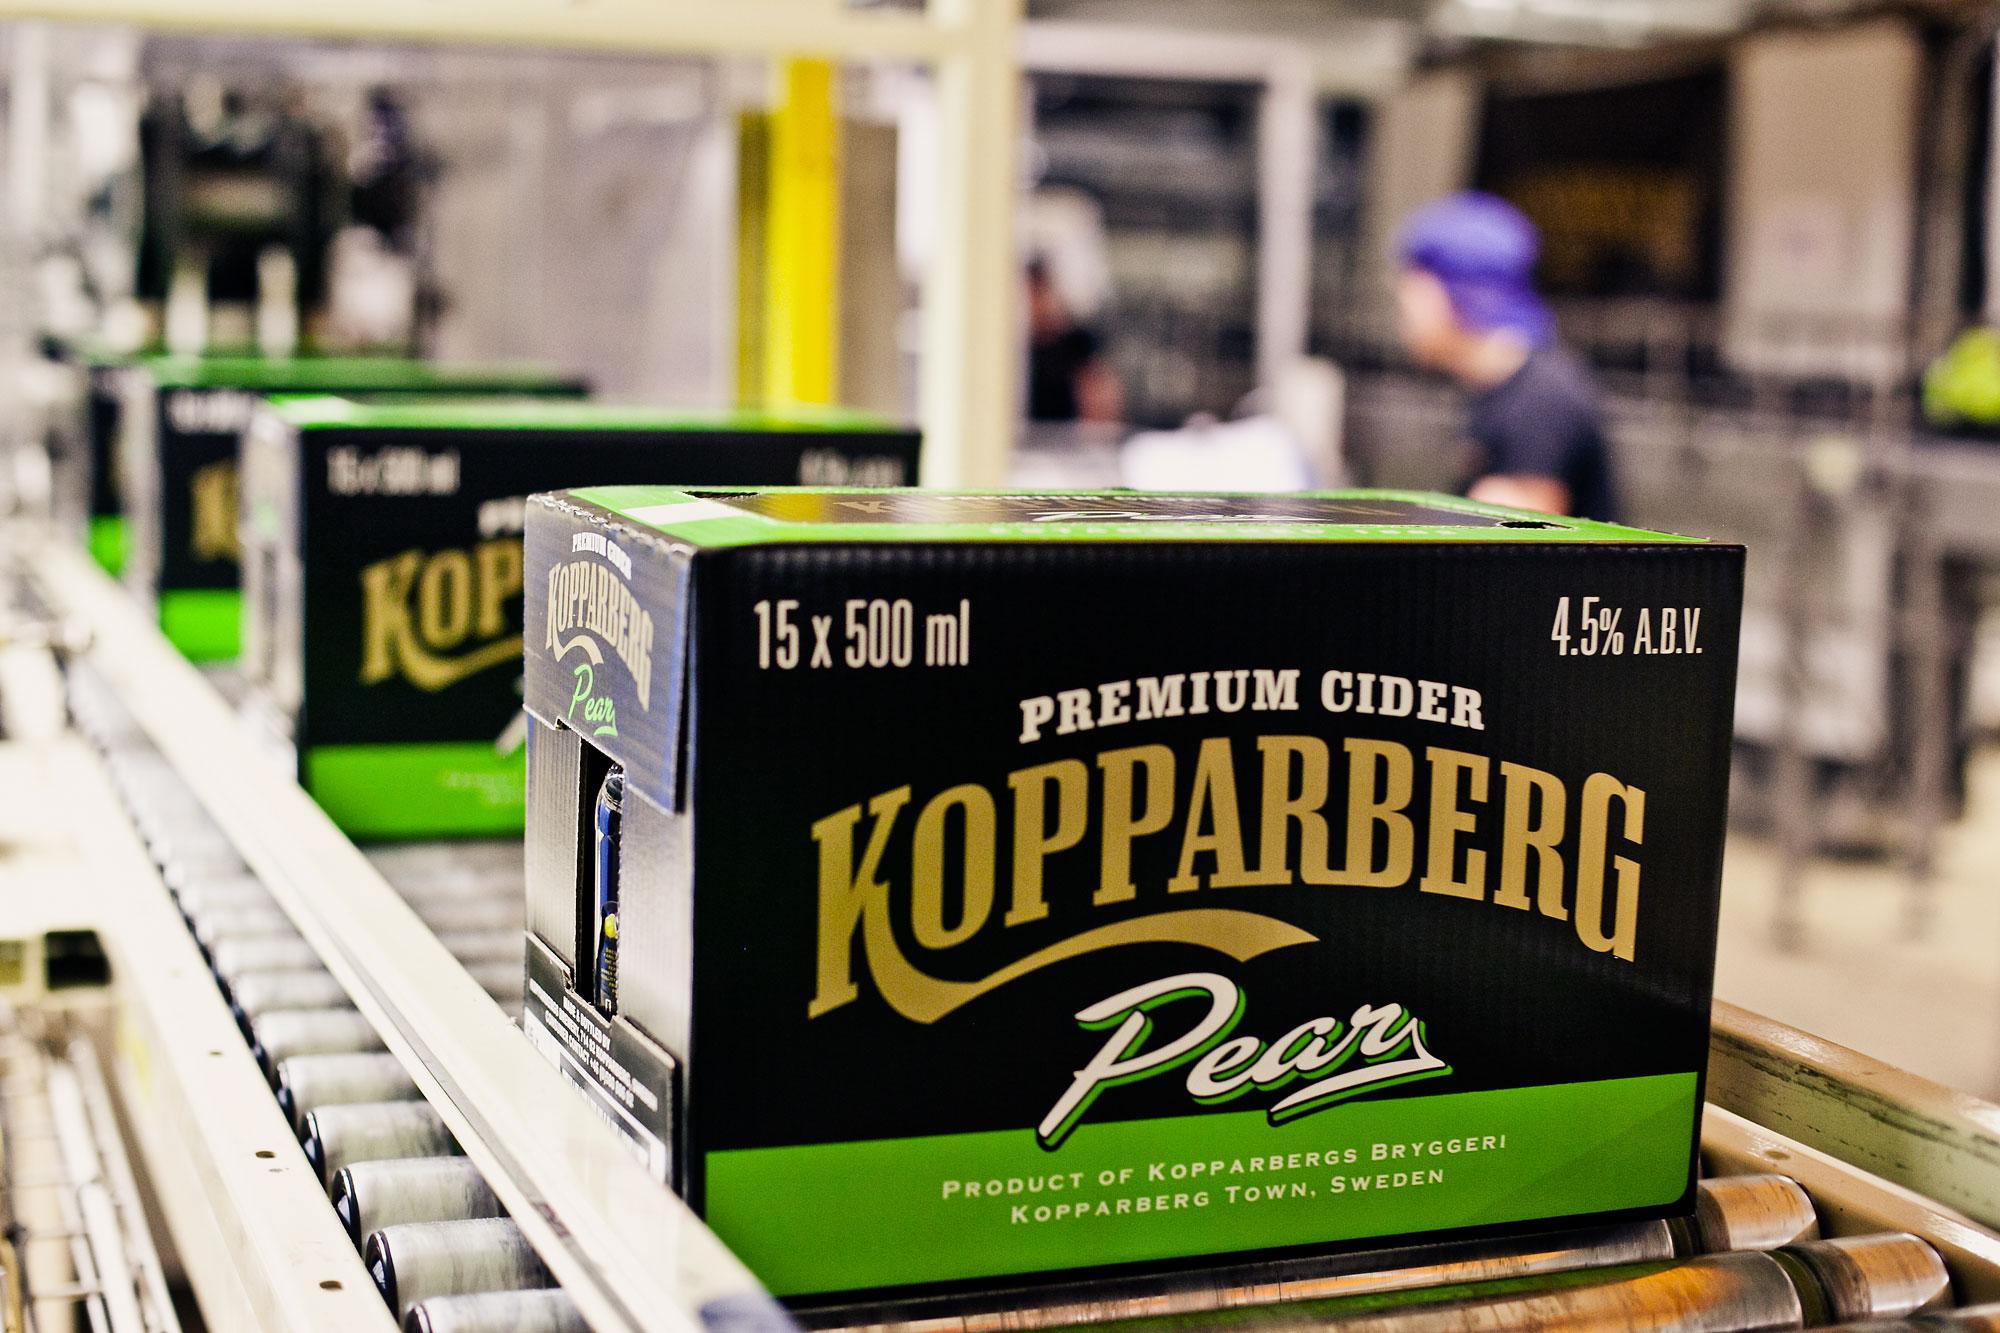 Kopparbergs bryggeri jobb